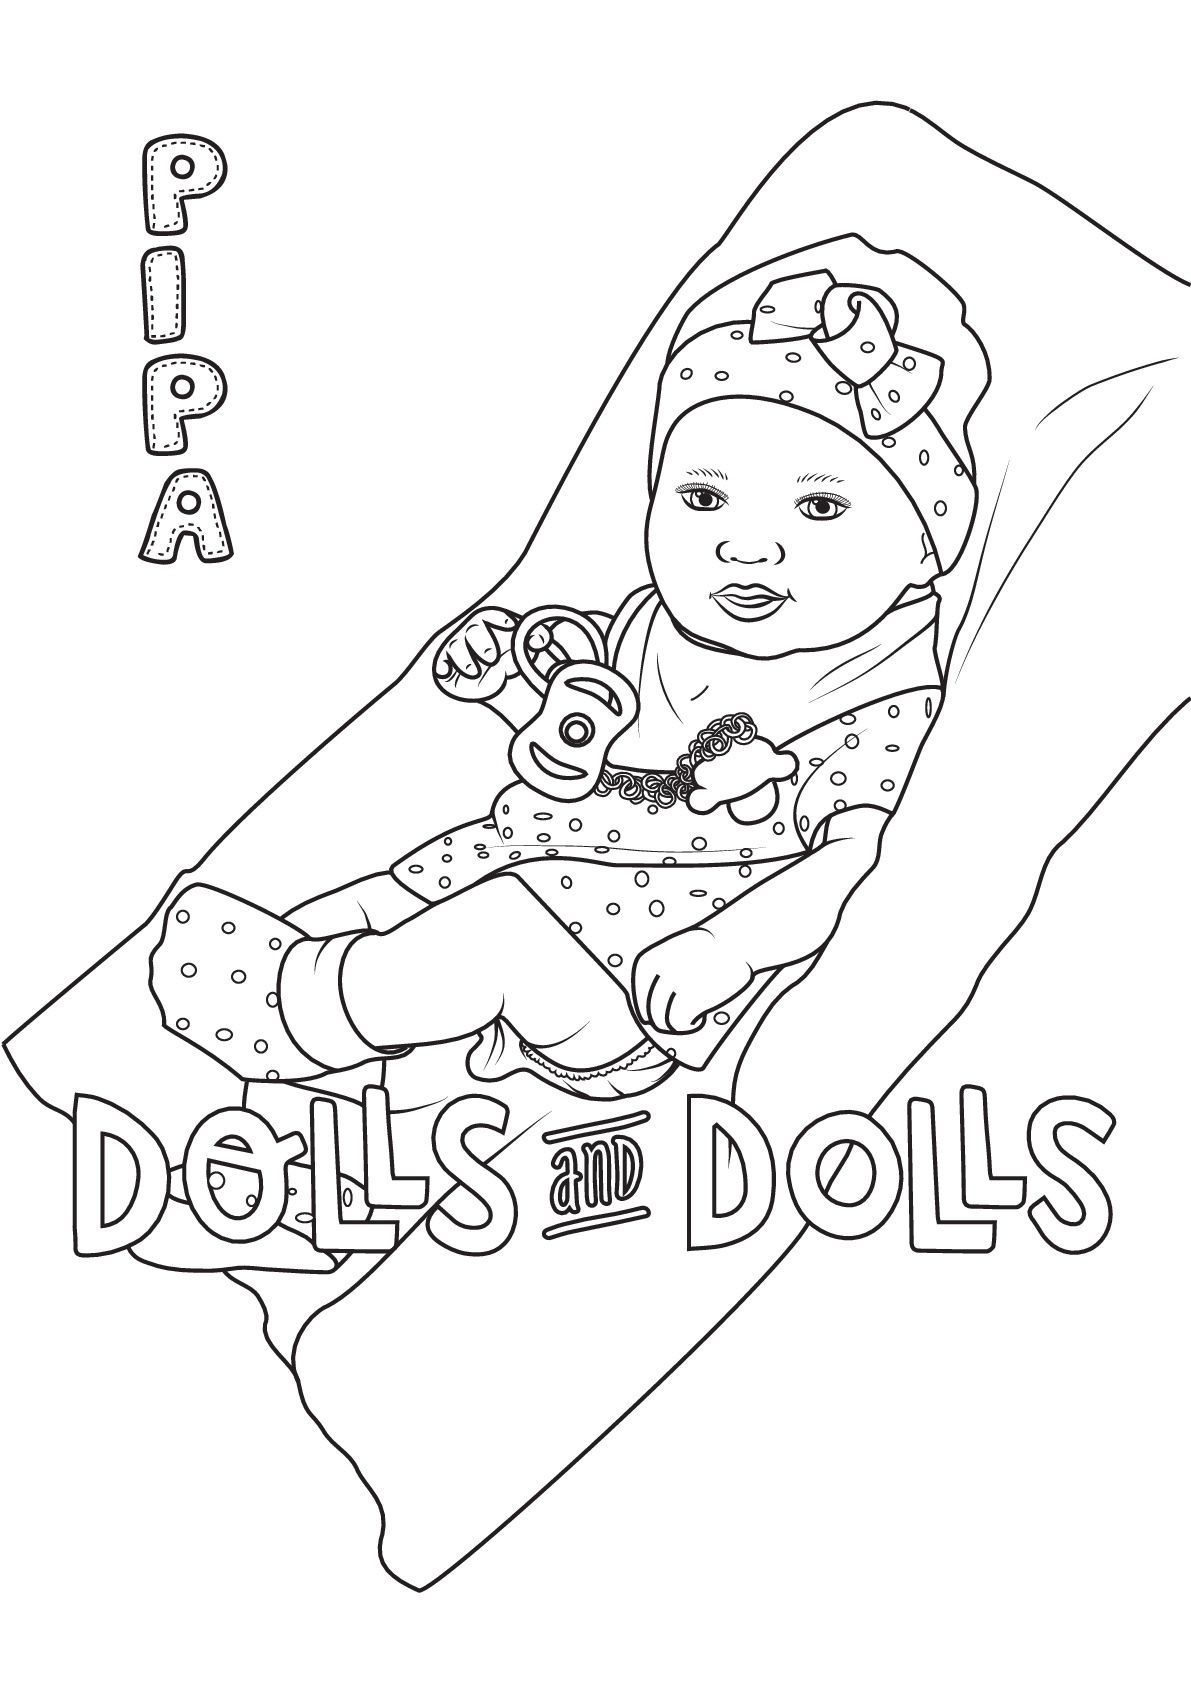 Dibujos de MUÑECAS para COLOREAR GRATIS - Dolls And Dolls | Dibujos ...